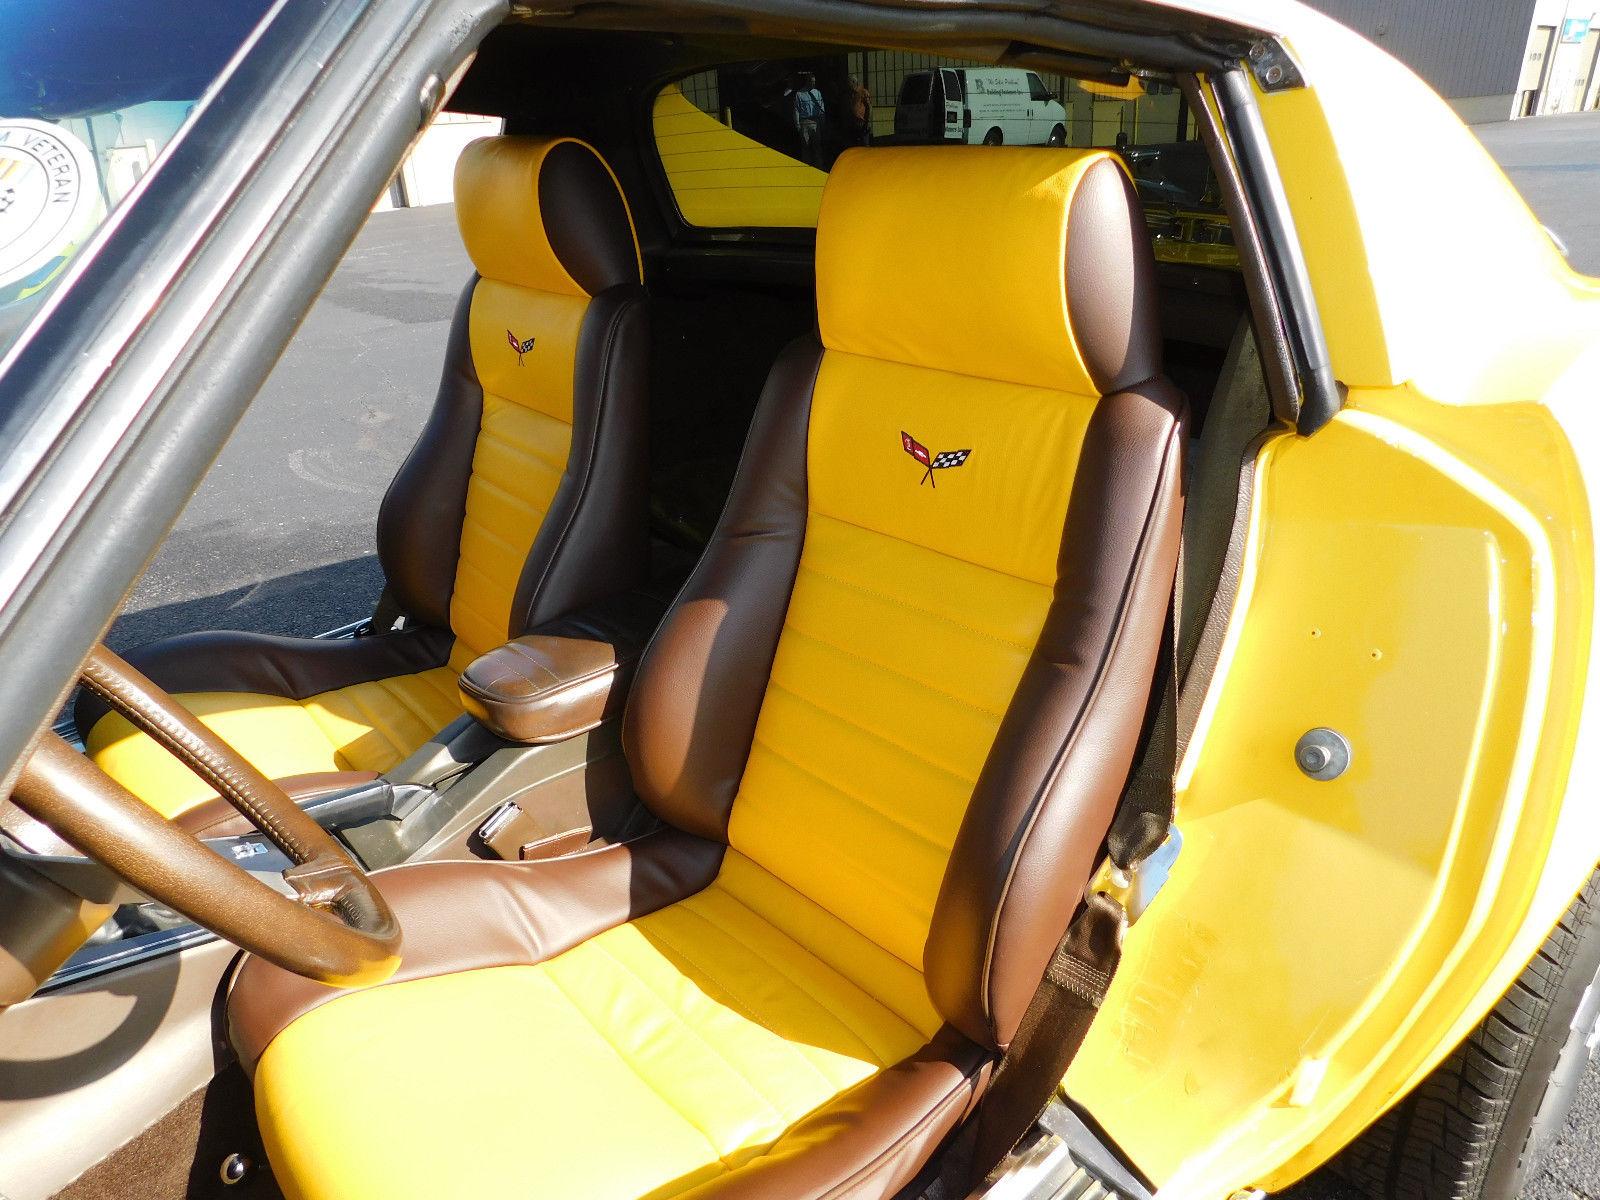 1977 Chevrolet Corvette interior